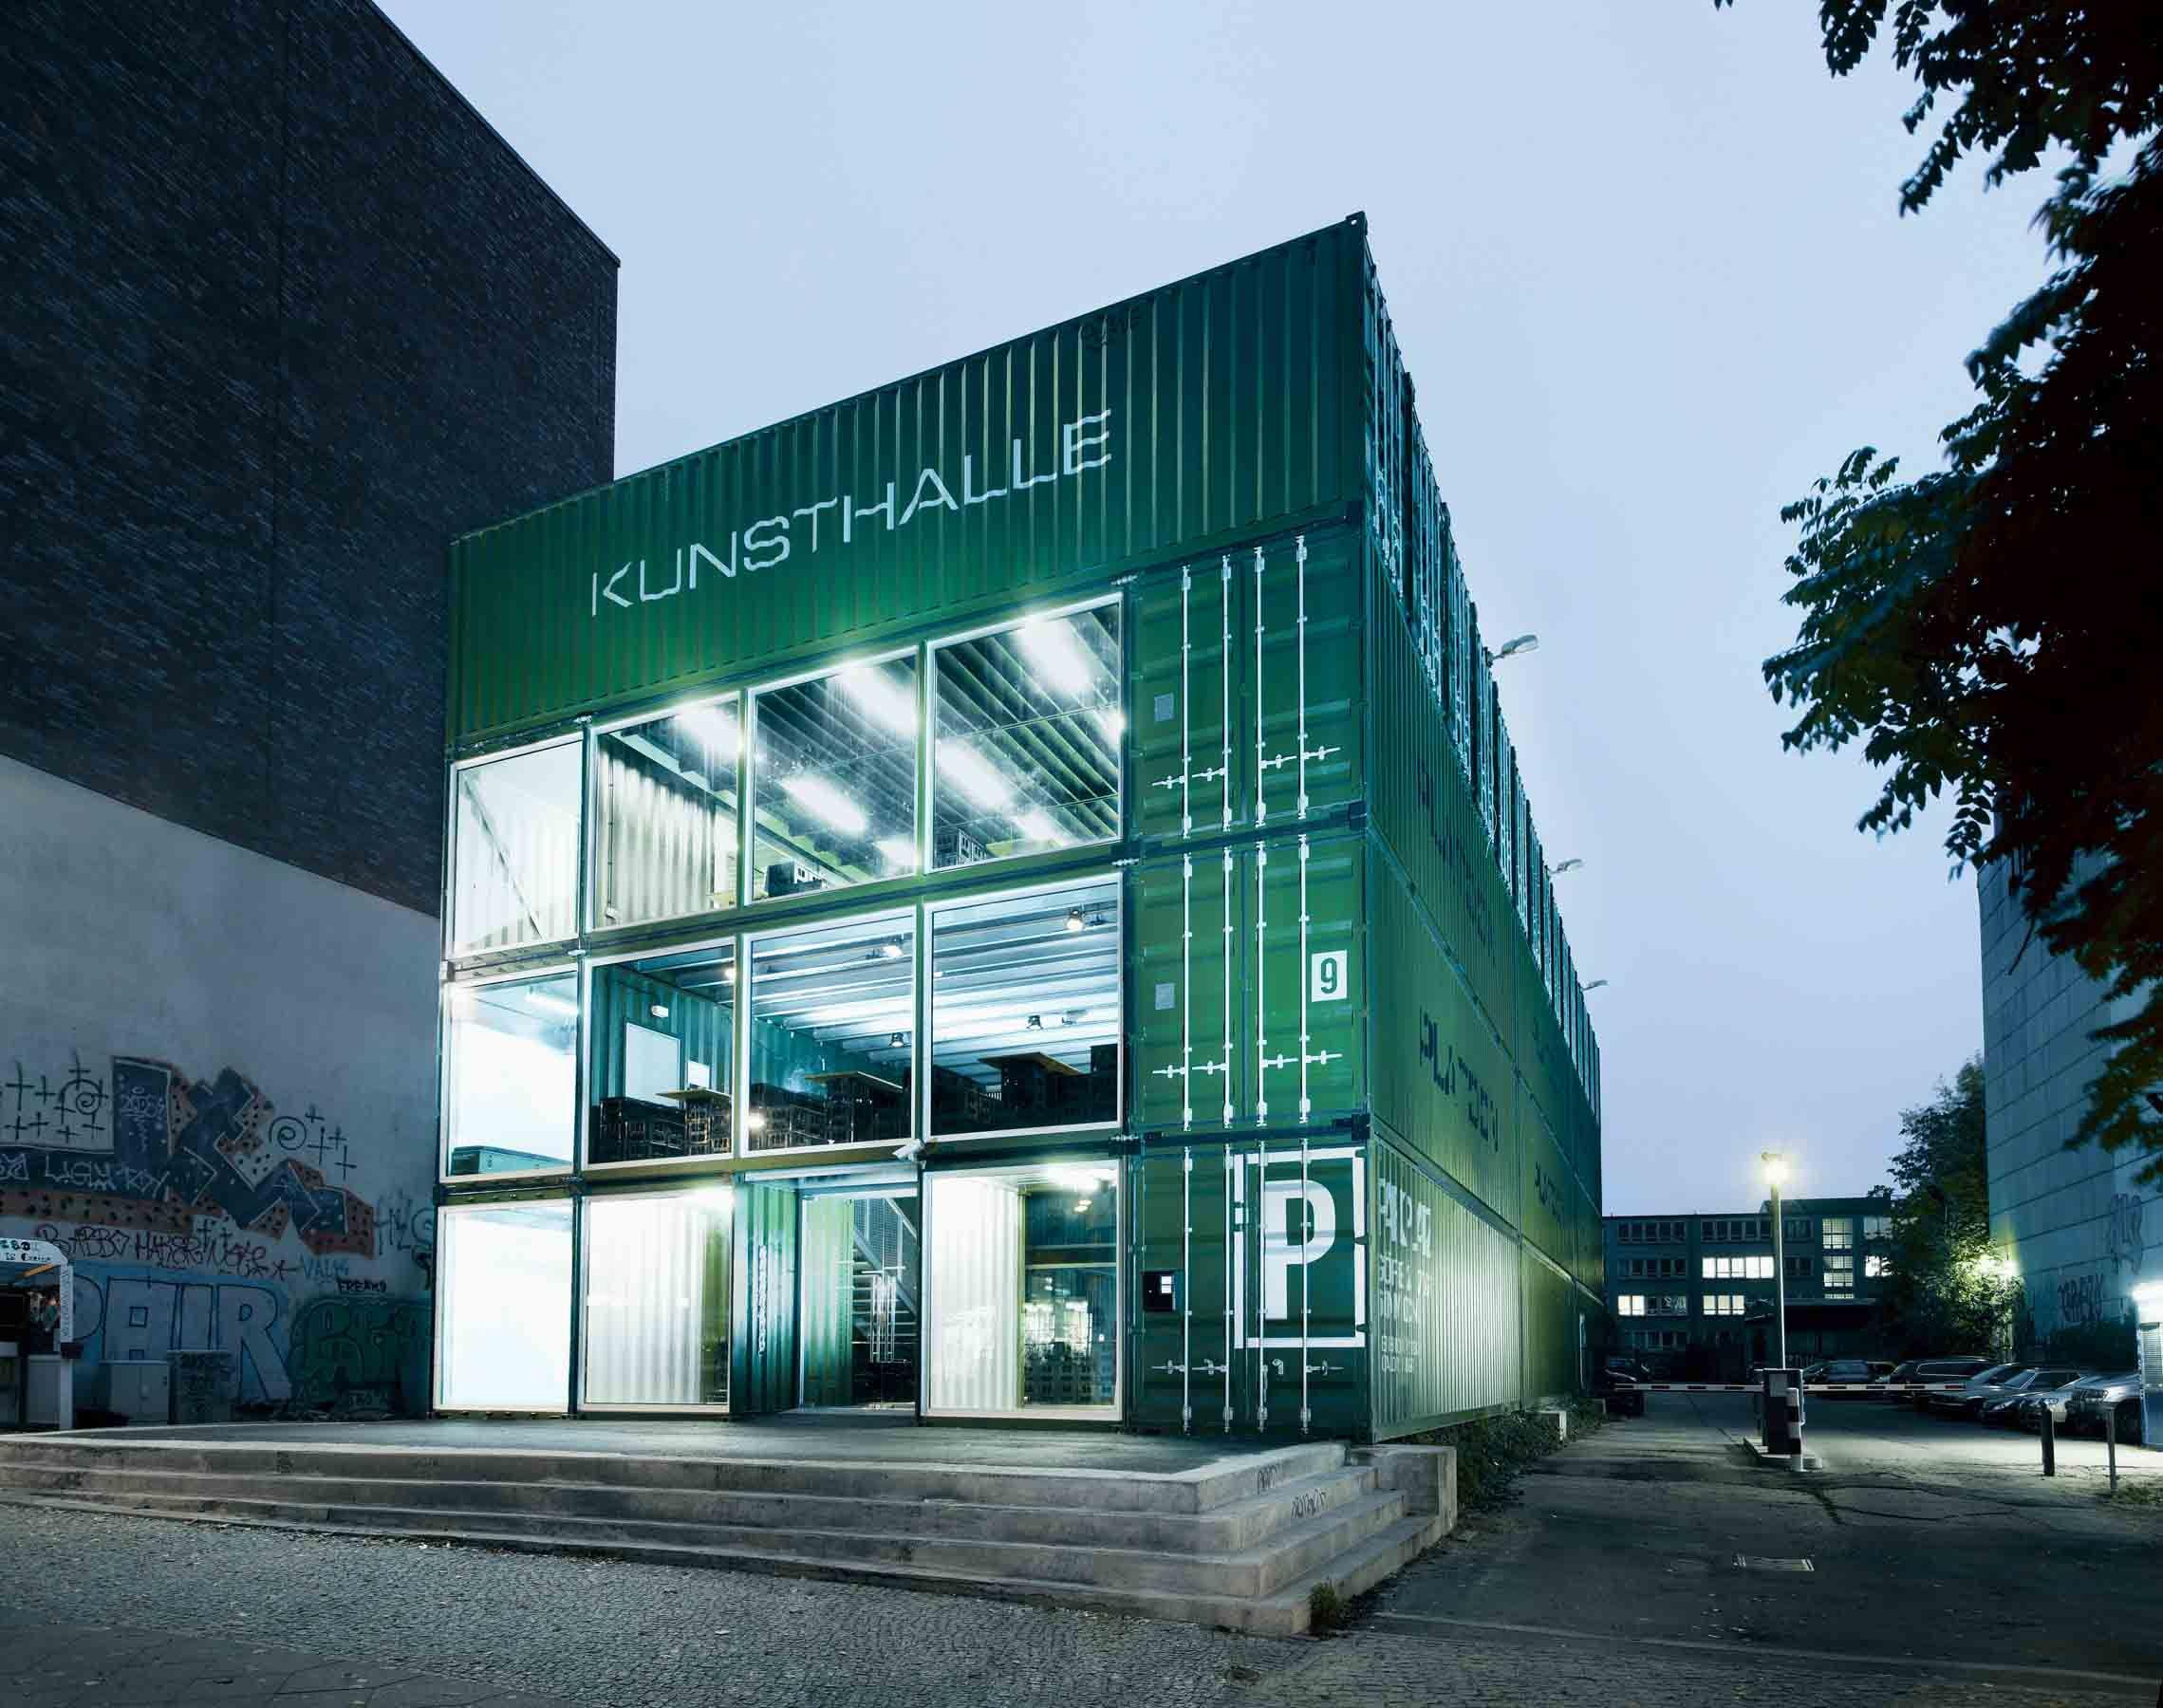 Container Haus Berlin projekt platoon kunsthalle berlin i architekten graft